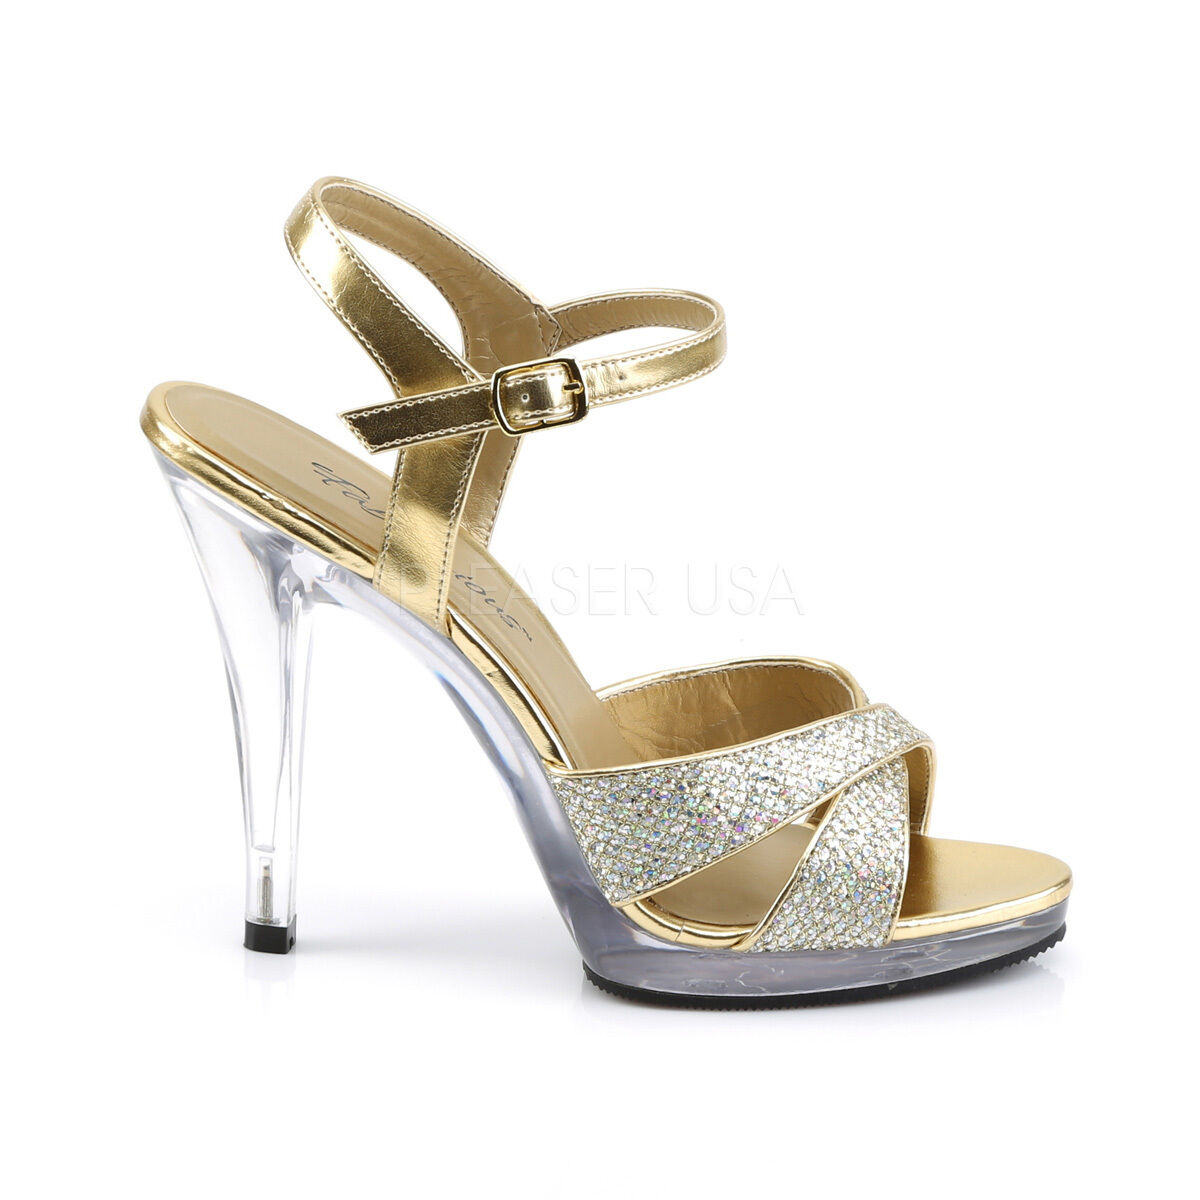 Fabulicious 4.5  Heel Mini Platform gold Glitter Buckle Princess Sandals 5-16